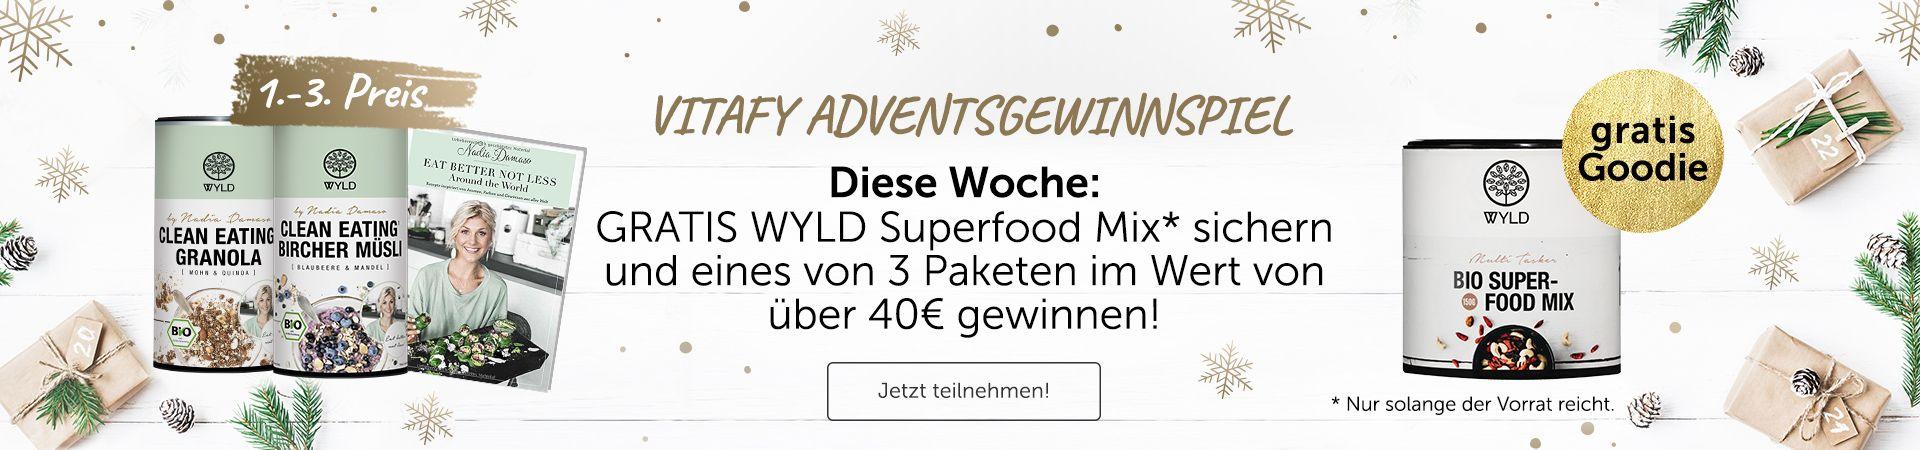 20181211_Adventskalender-Gewinnspiel_Woche3 WYLD